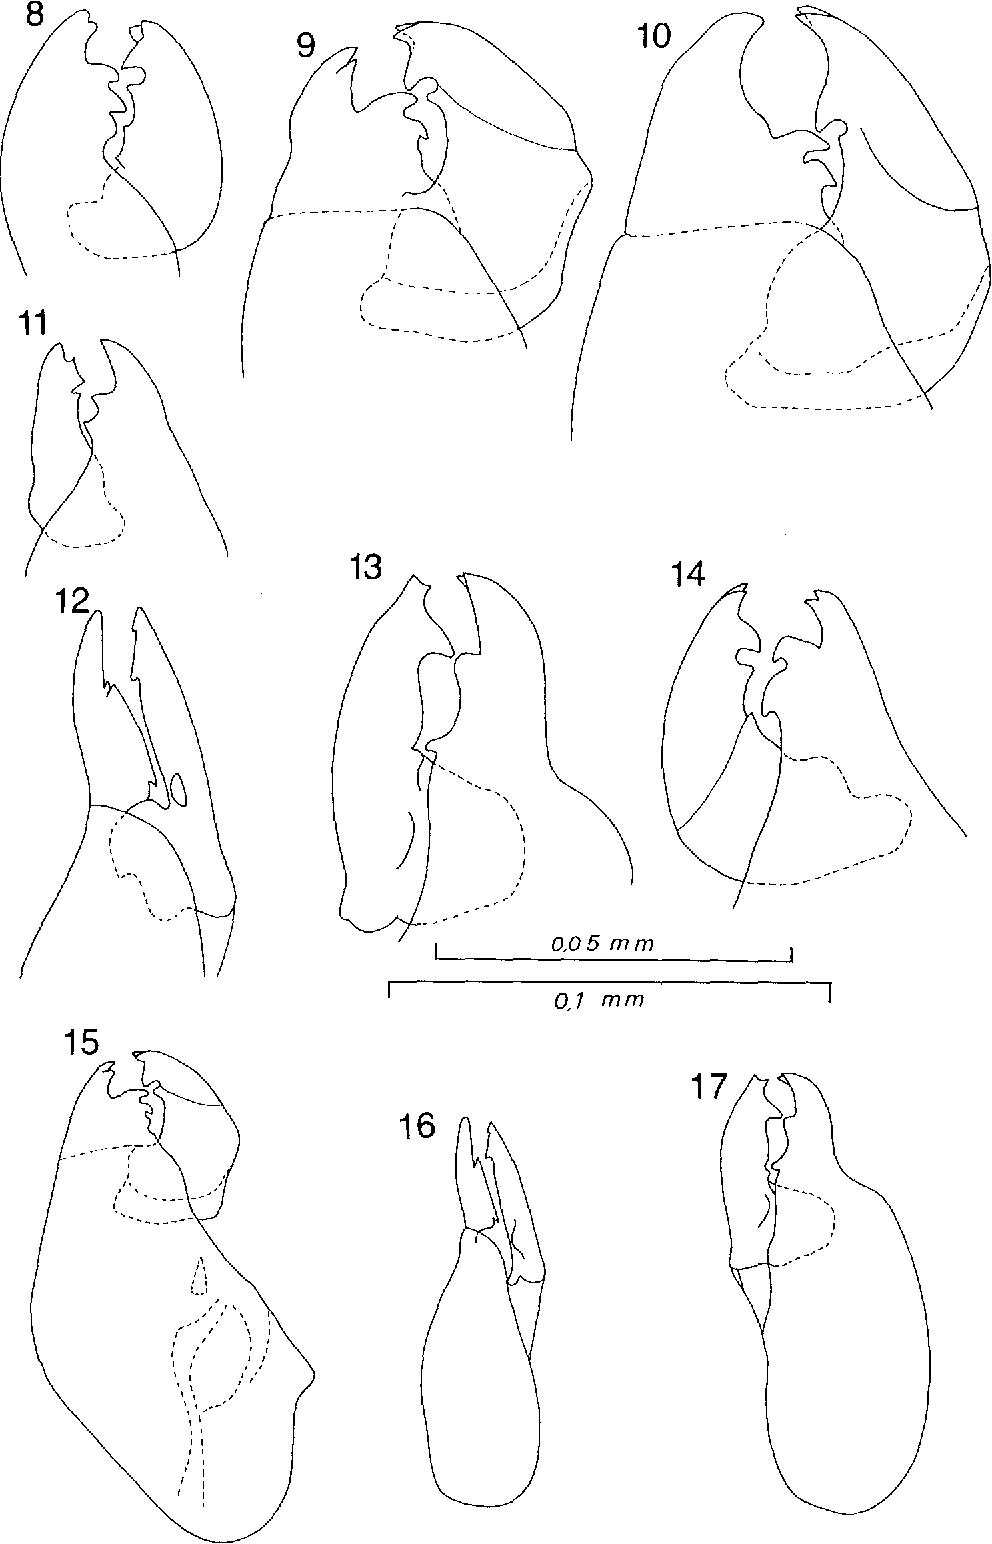 figure 8-17